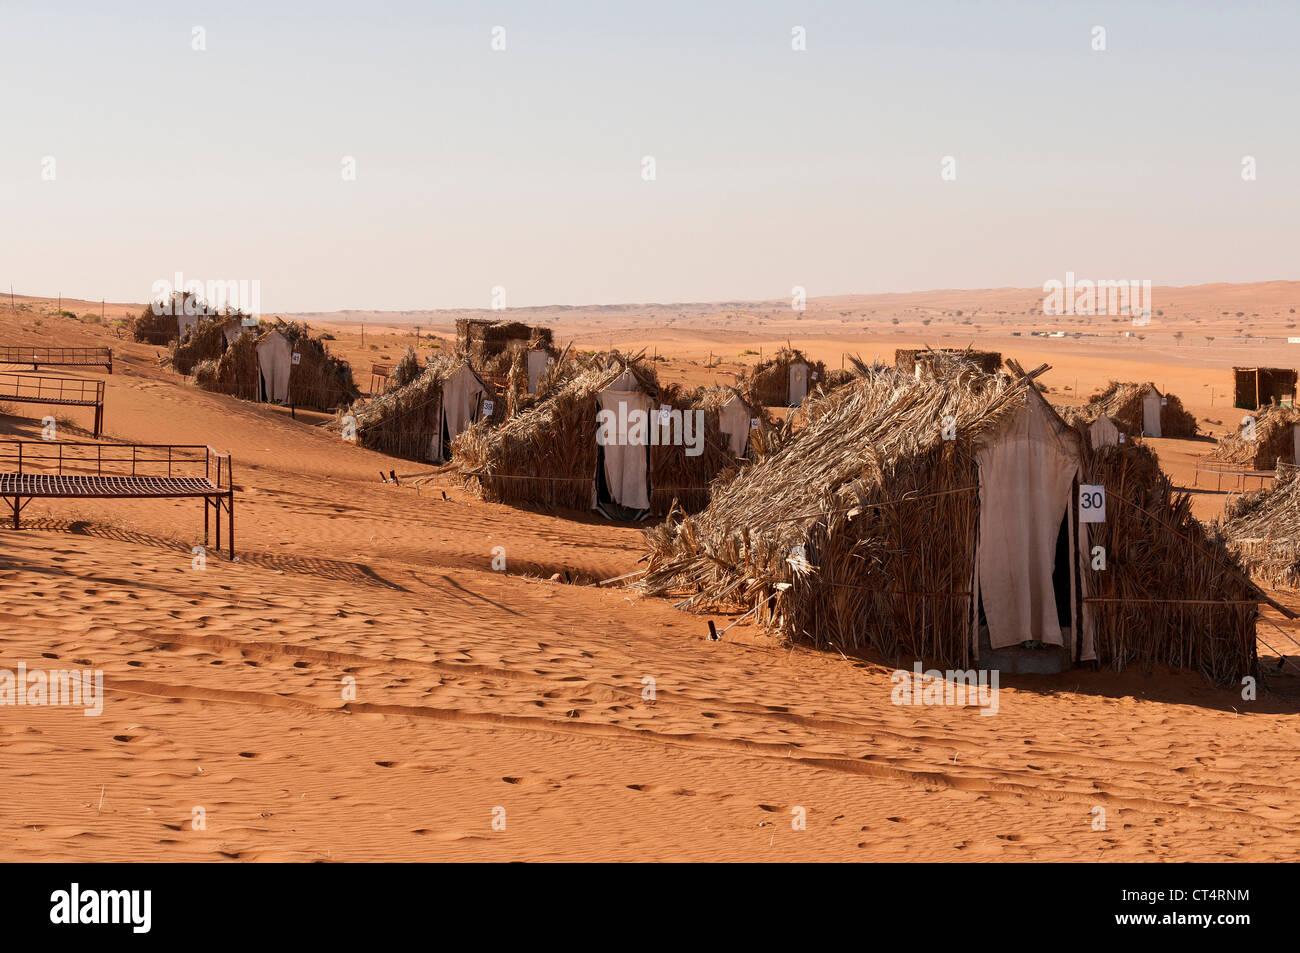 Elk207-2142 Oman, Wahibah (Sharqiya) Sands, Al Areesh camp - Stock Image